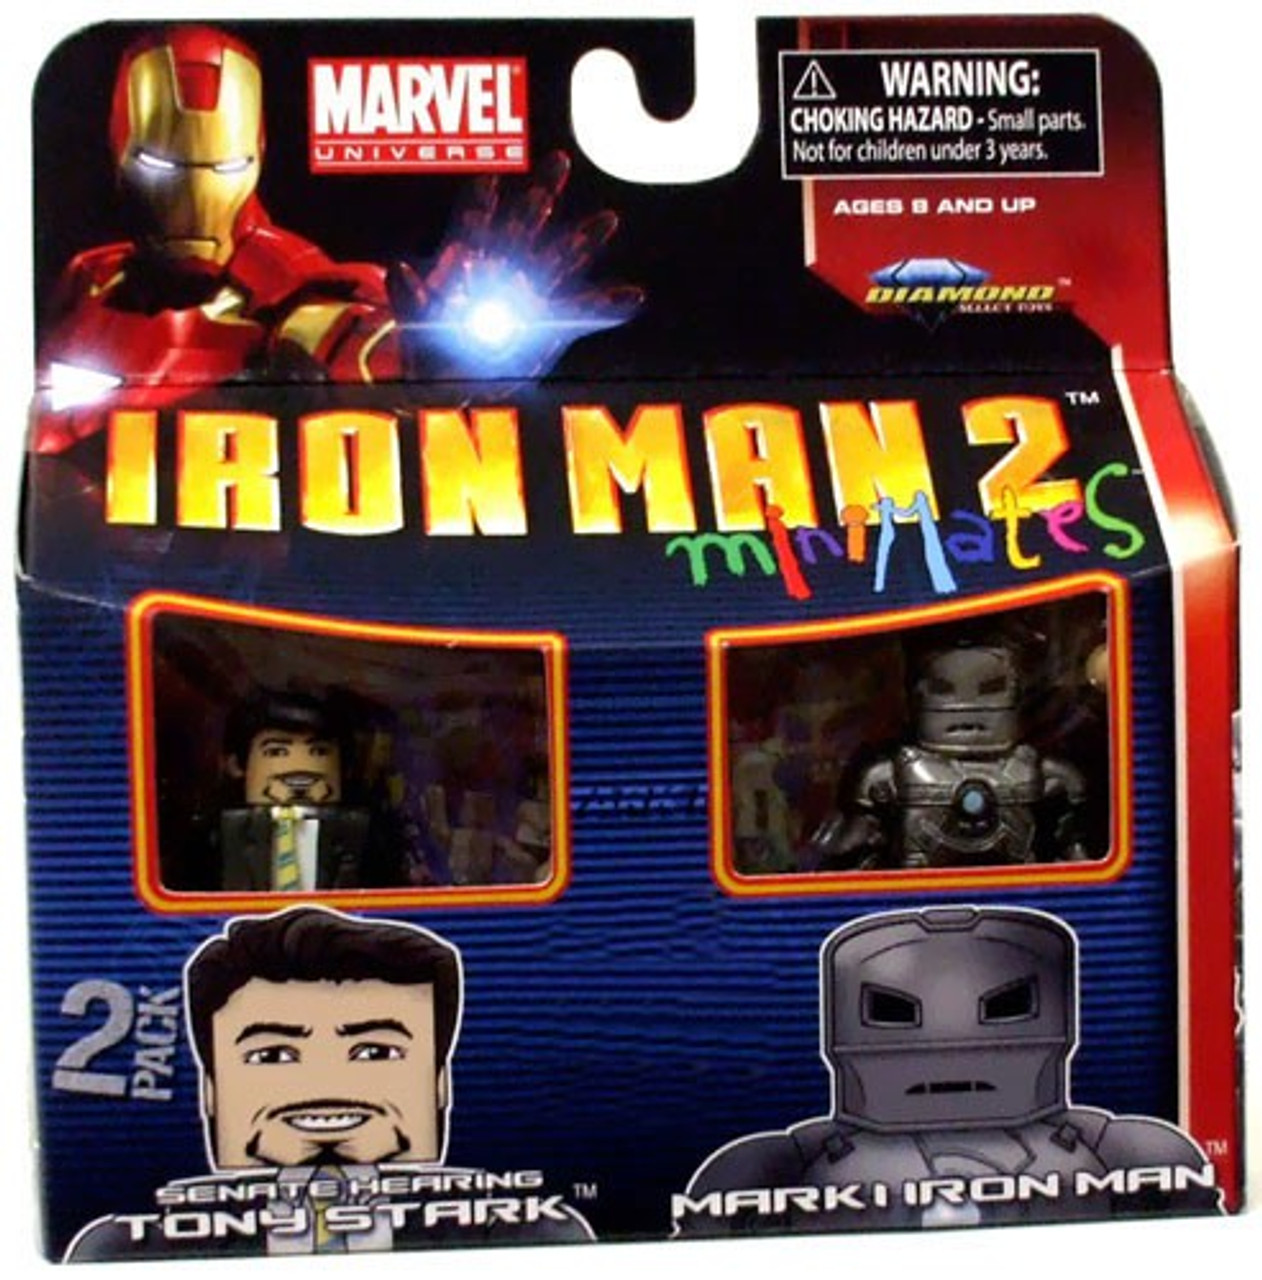 Marvel Universe Minimates Iron Man 2 Senate Hearing Tony Stark & Mark I Iron Man Exclusive Minifigure 2-Pack